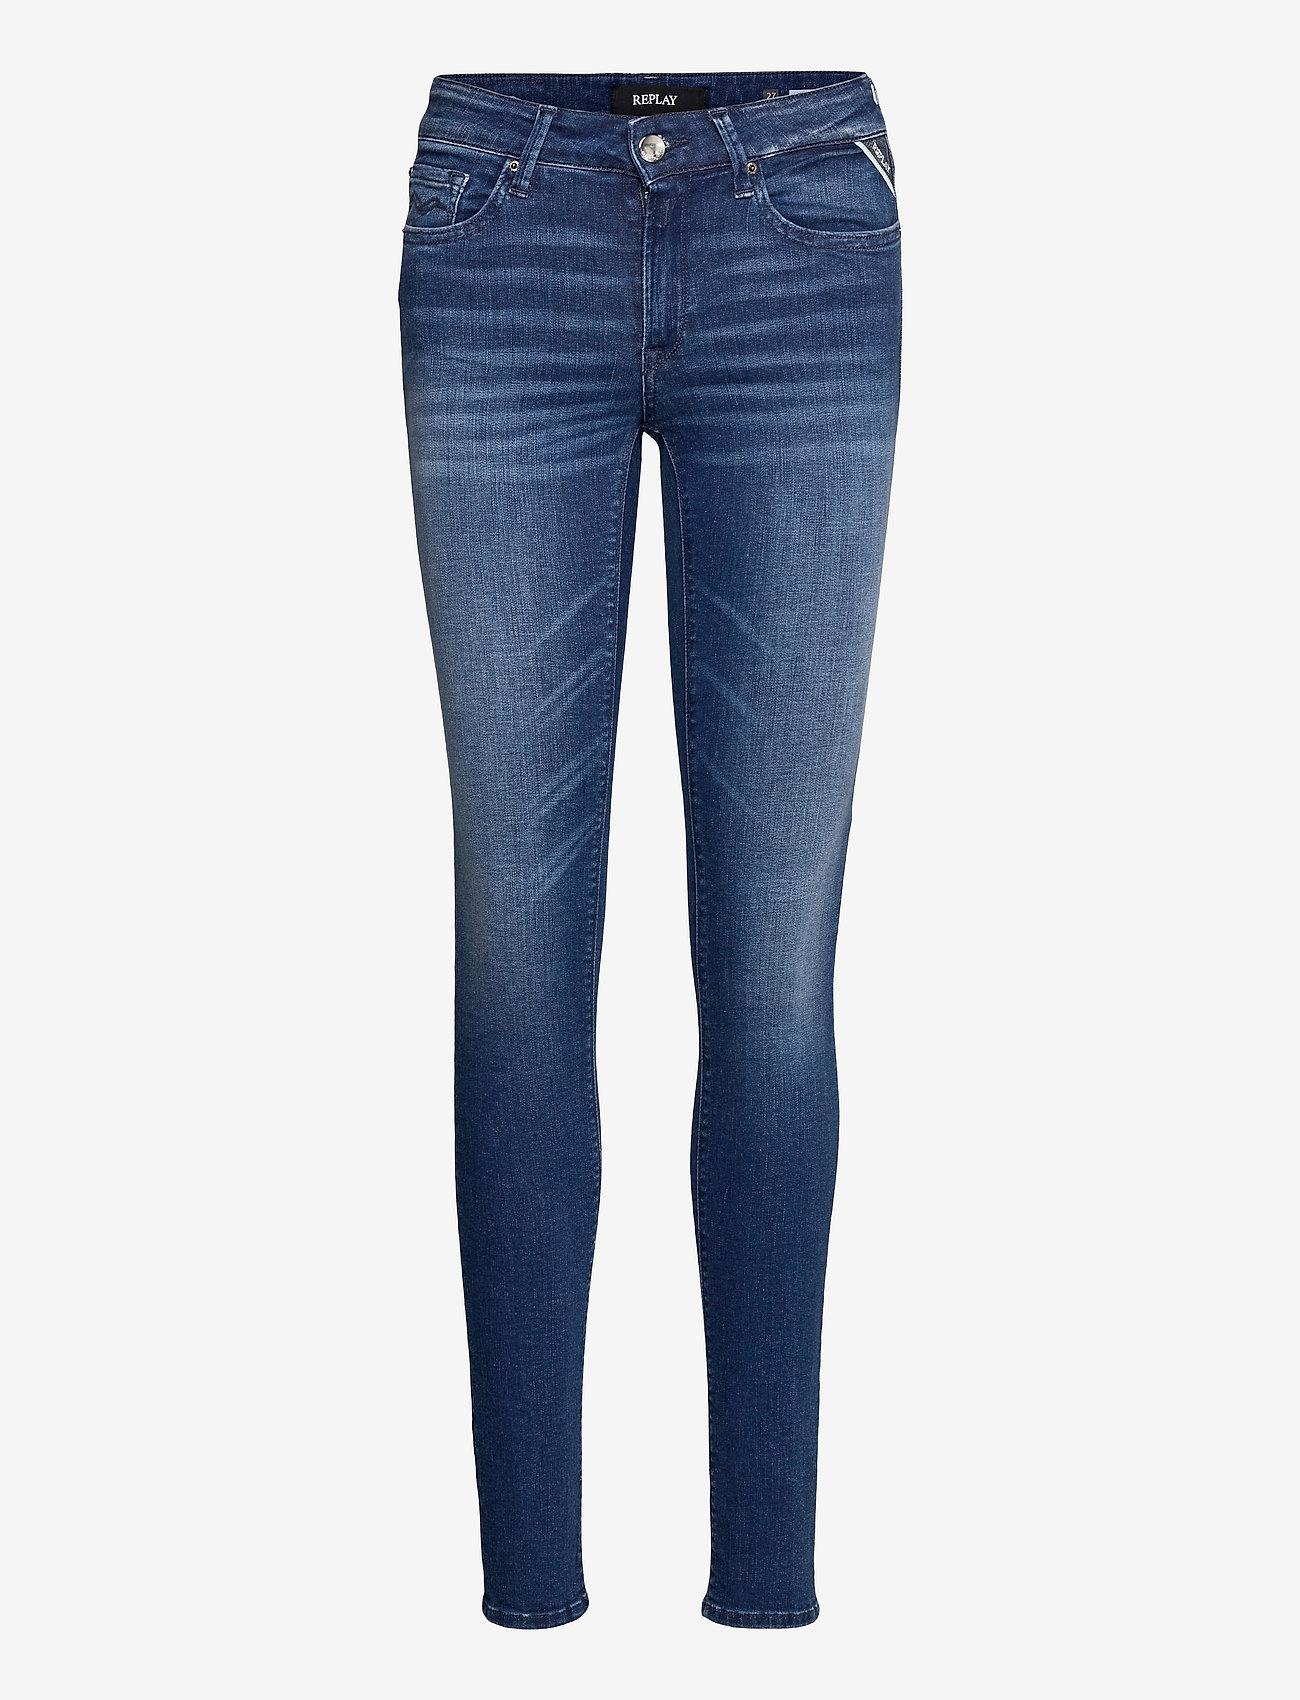 Replay - NEW LUZ - slim jeans - medium blue - 0